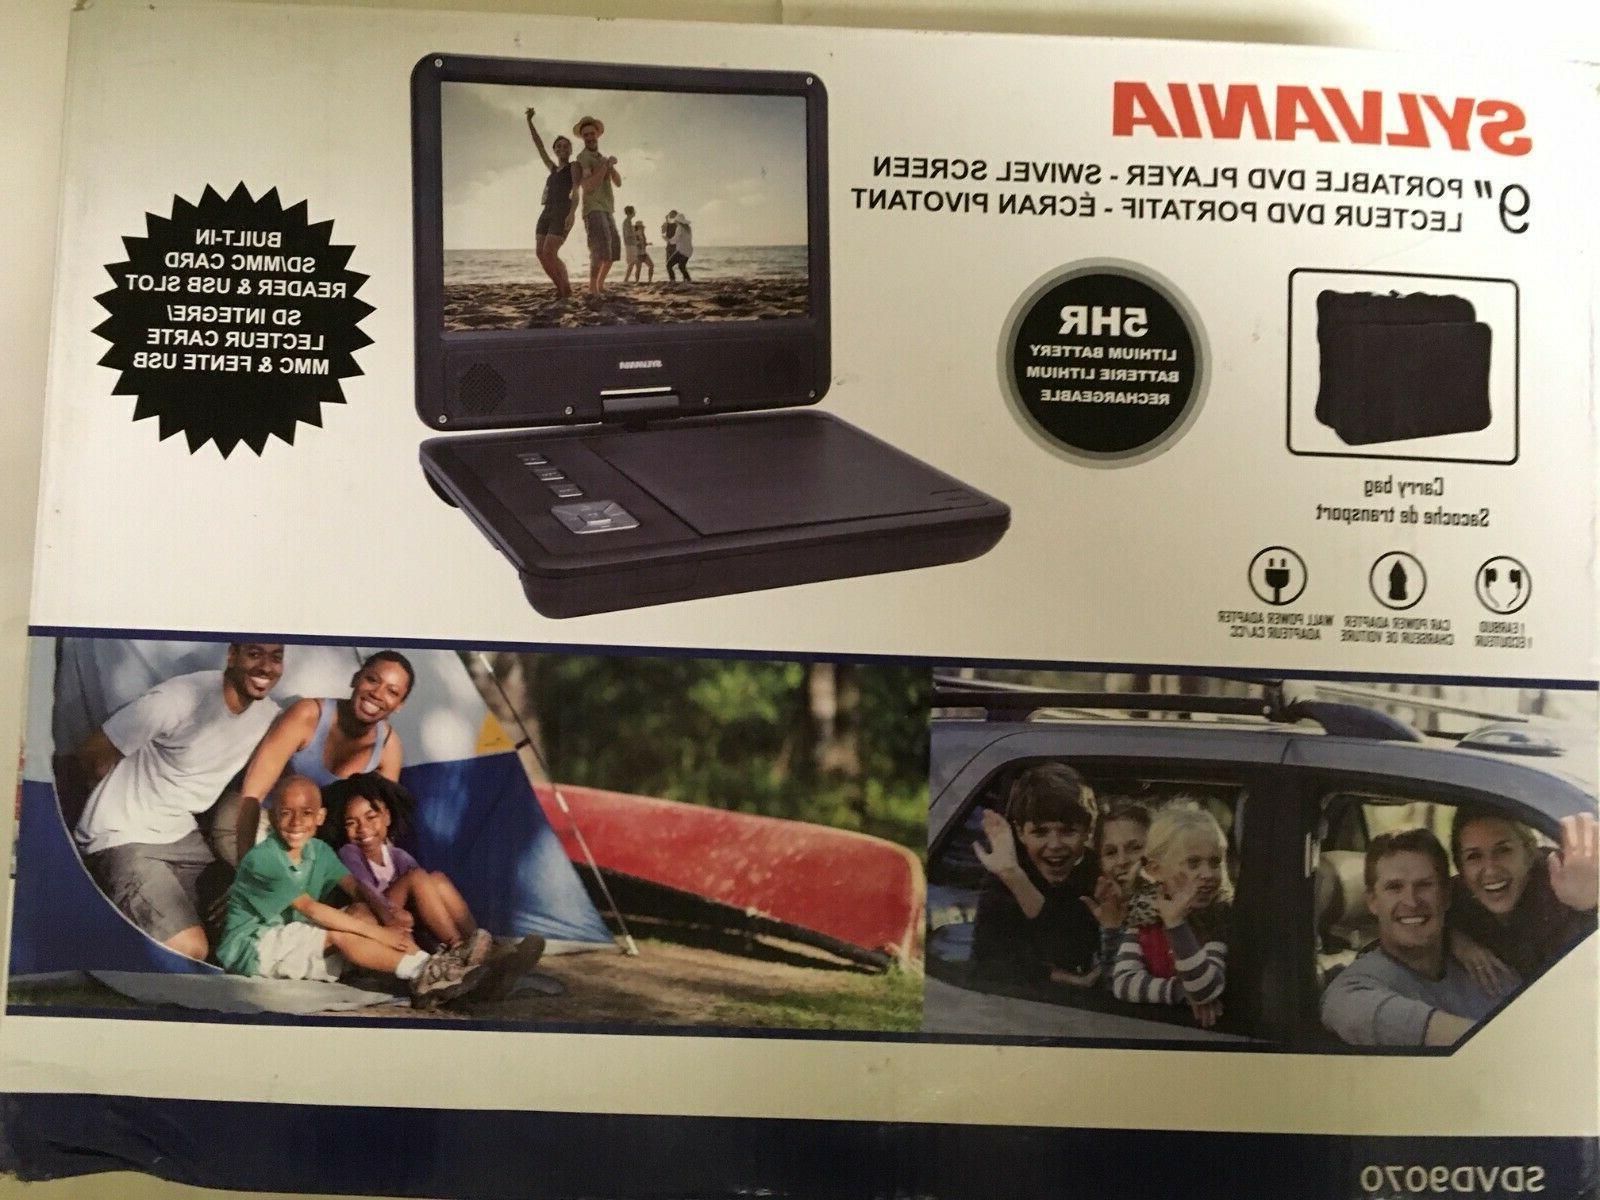 Sylvania DVD Media Player sale, models, gift